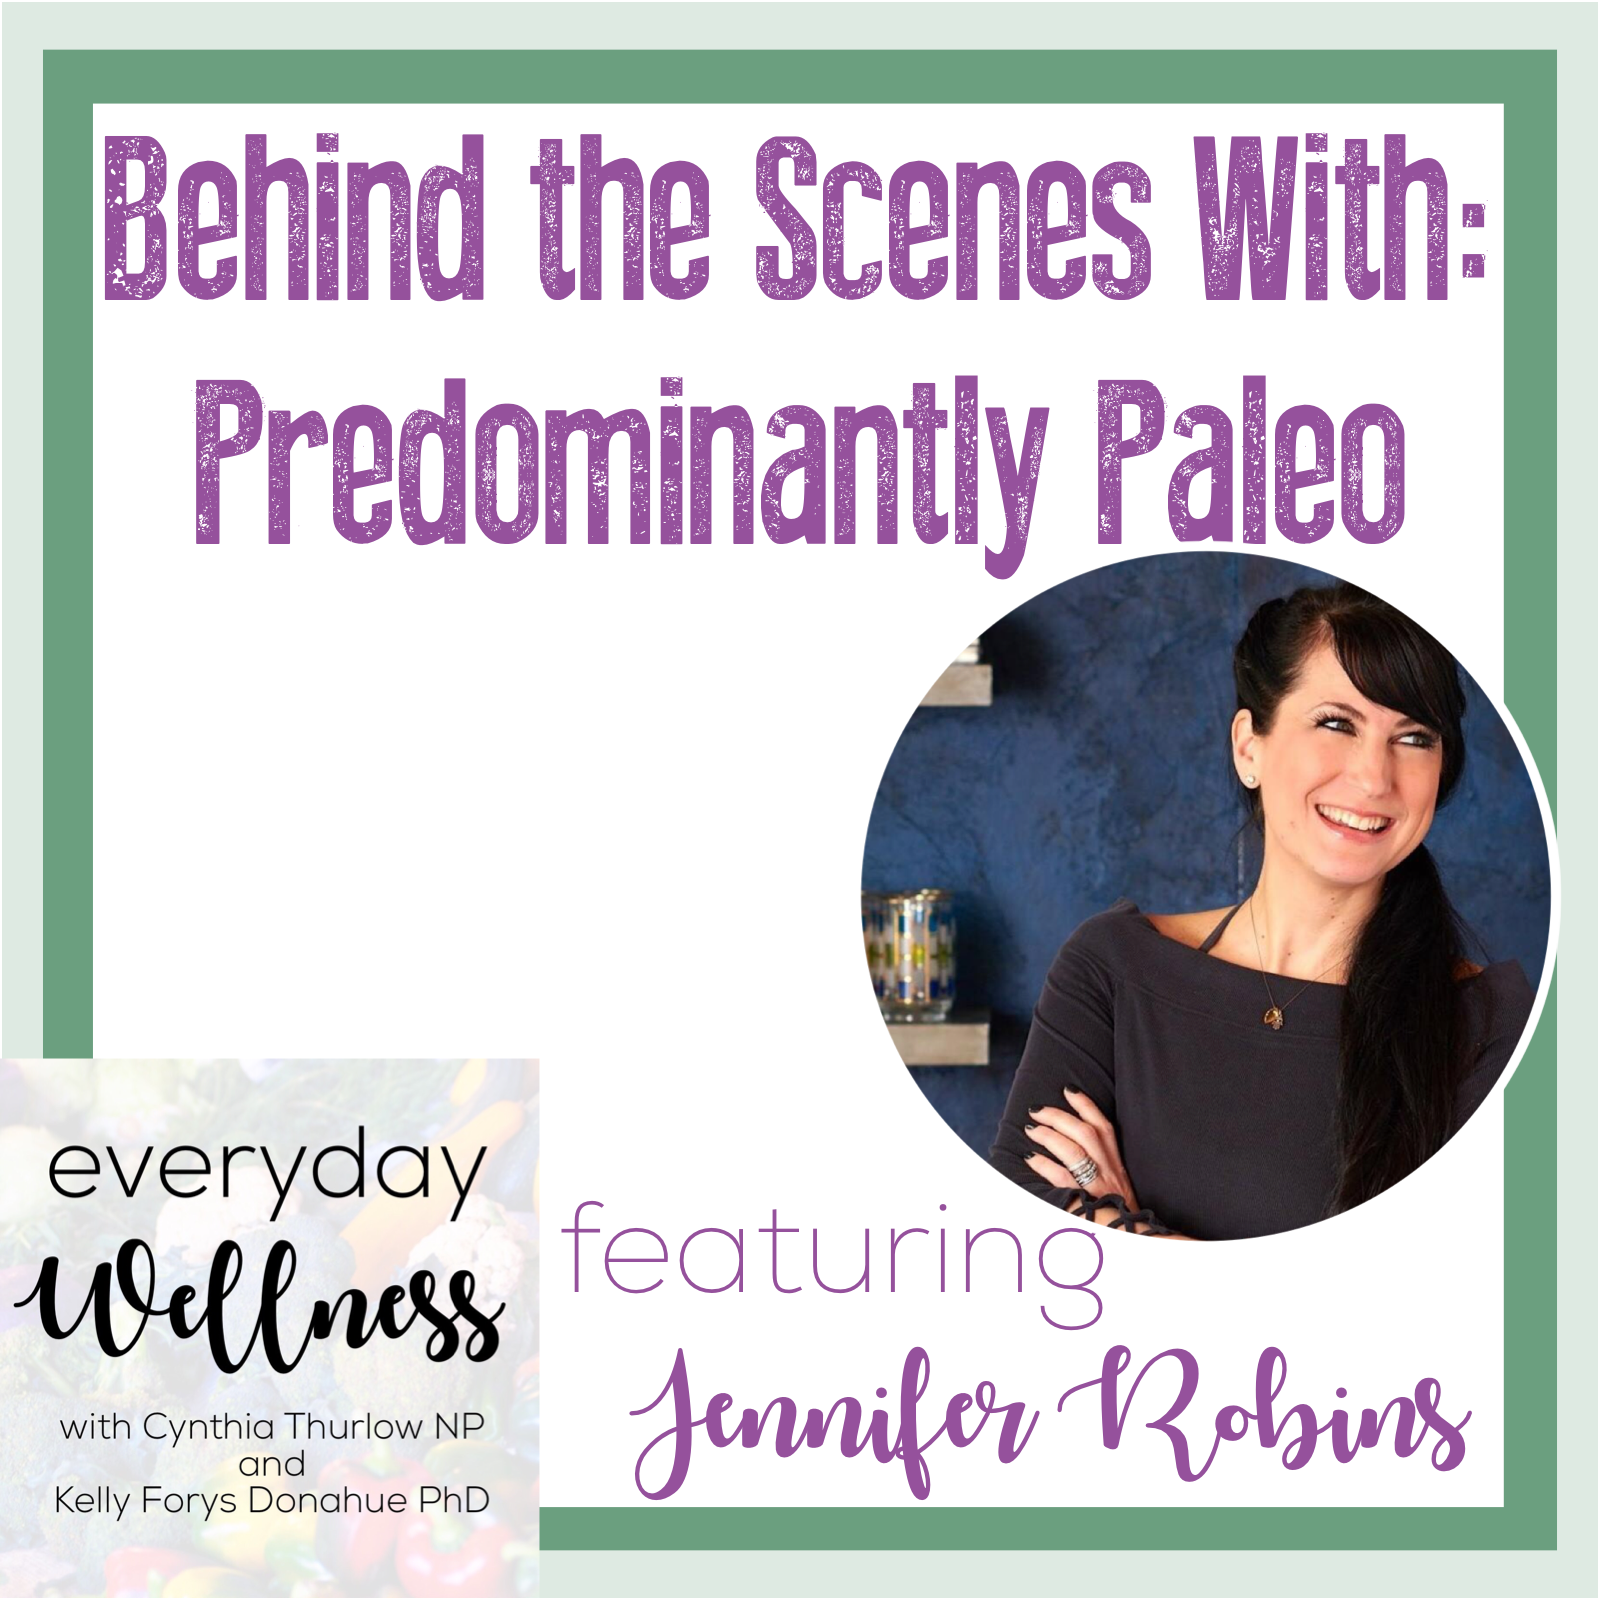 Episode 19: Jennifer Robins